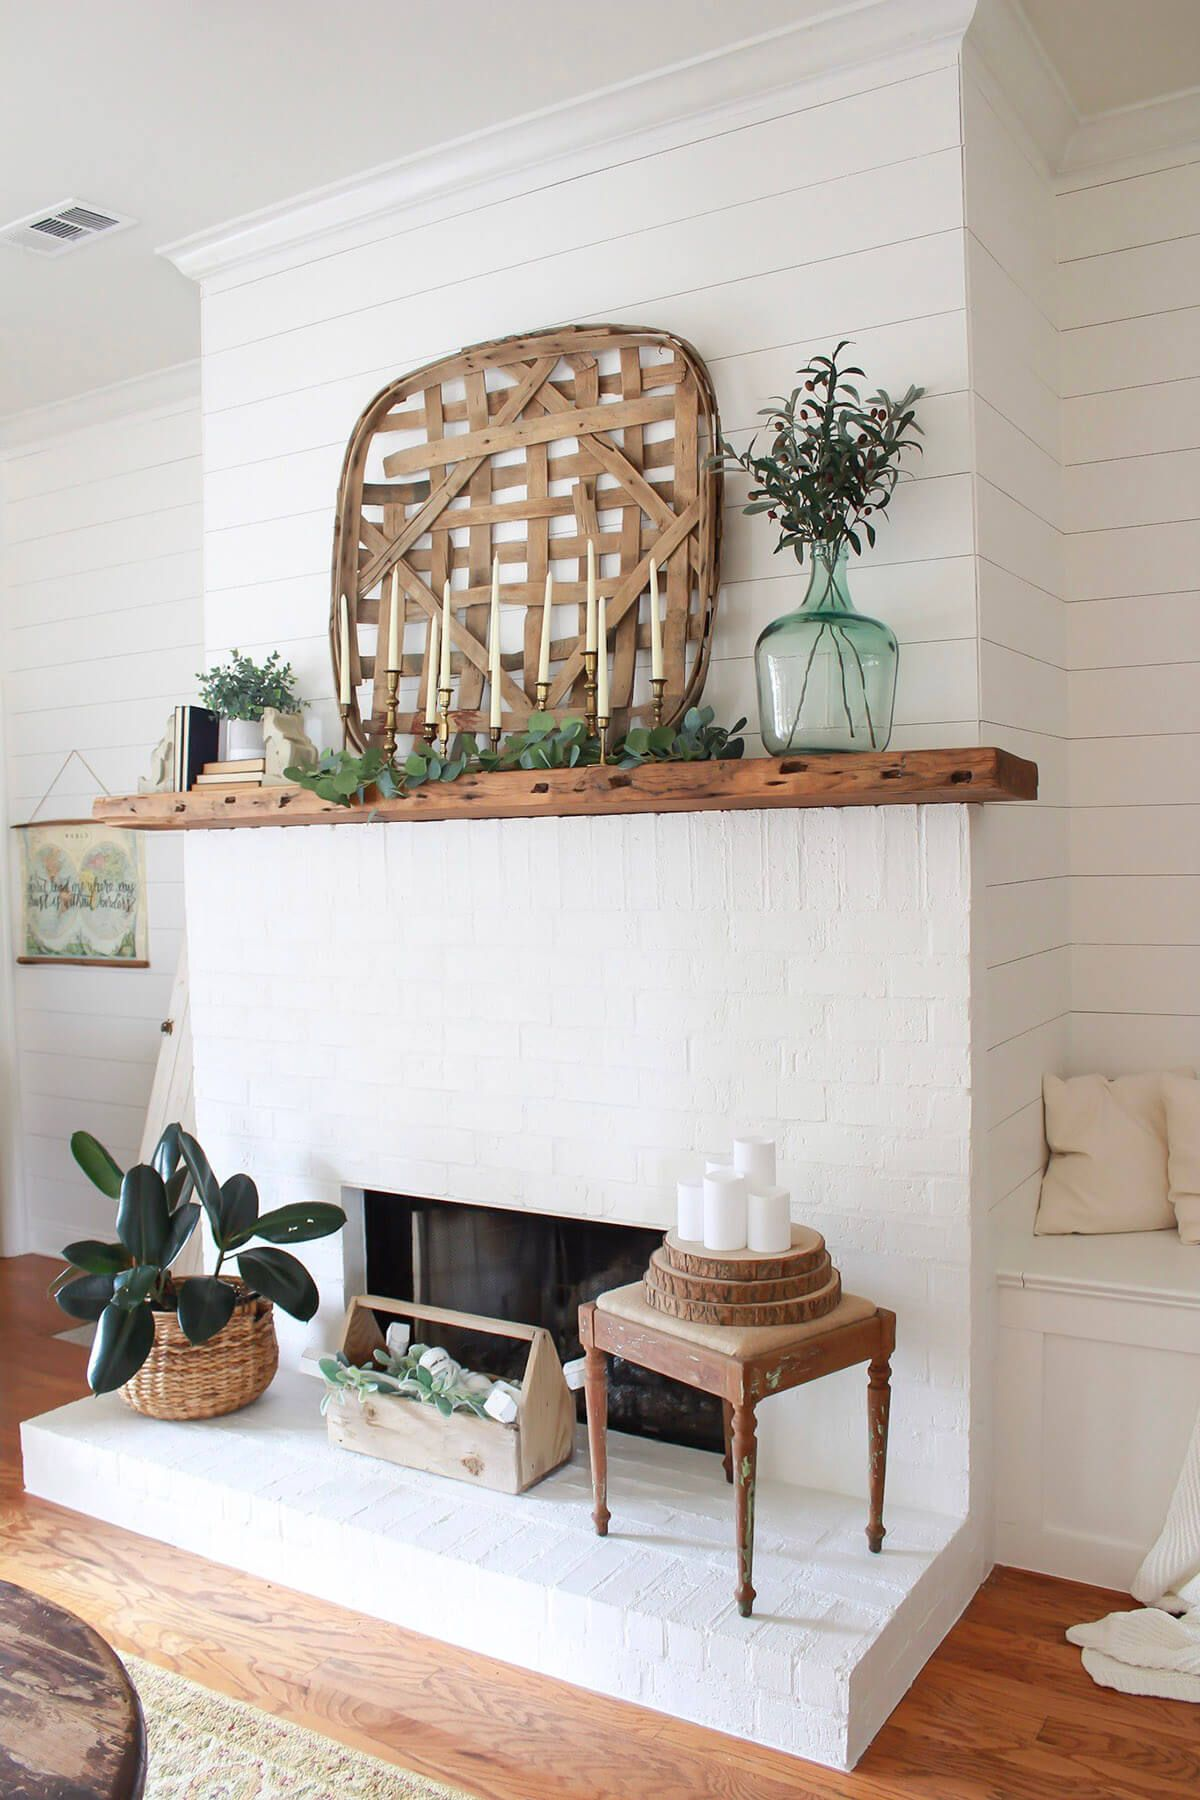 36 Lovely Farmhouse Plant Decor Ideas To Add A Touch Of Nature To Your Interior Plant Decor Vintage Decor Farmhouse Decor